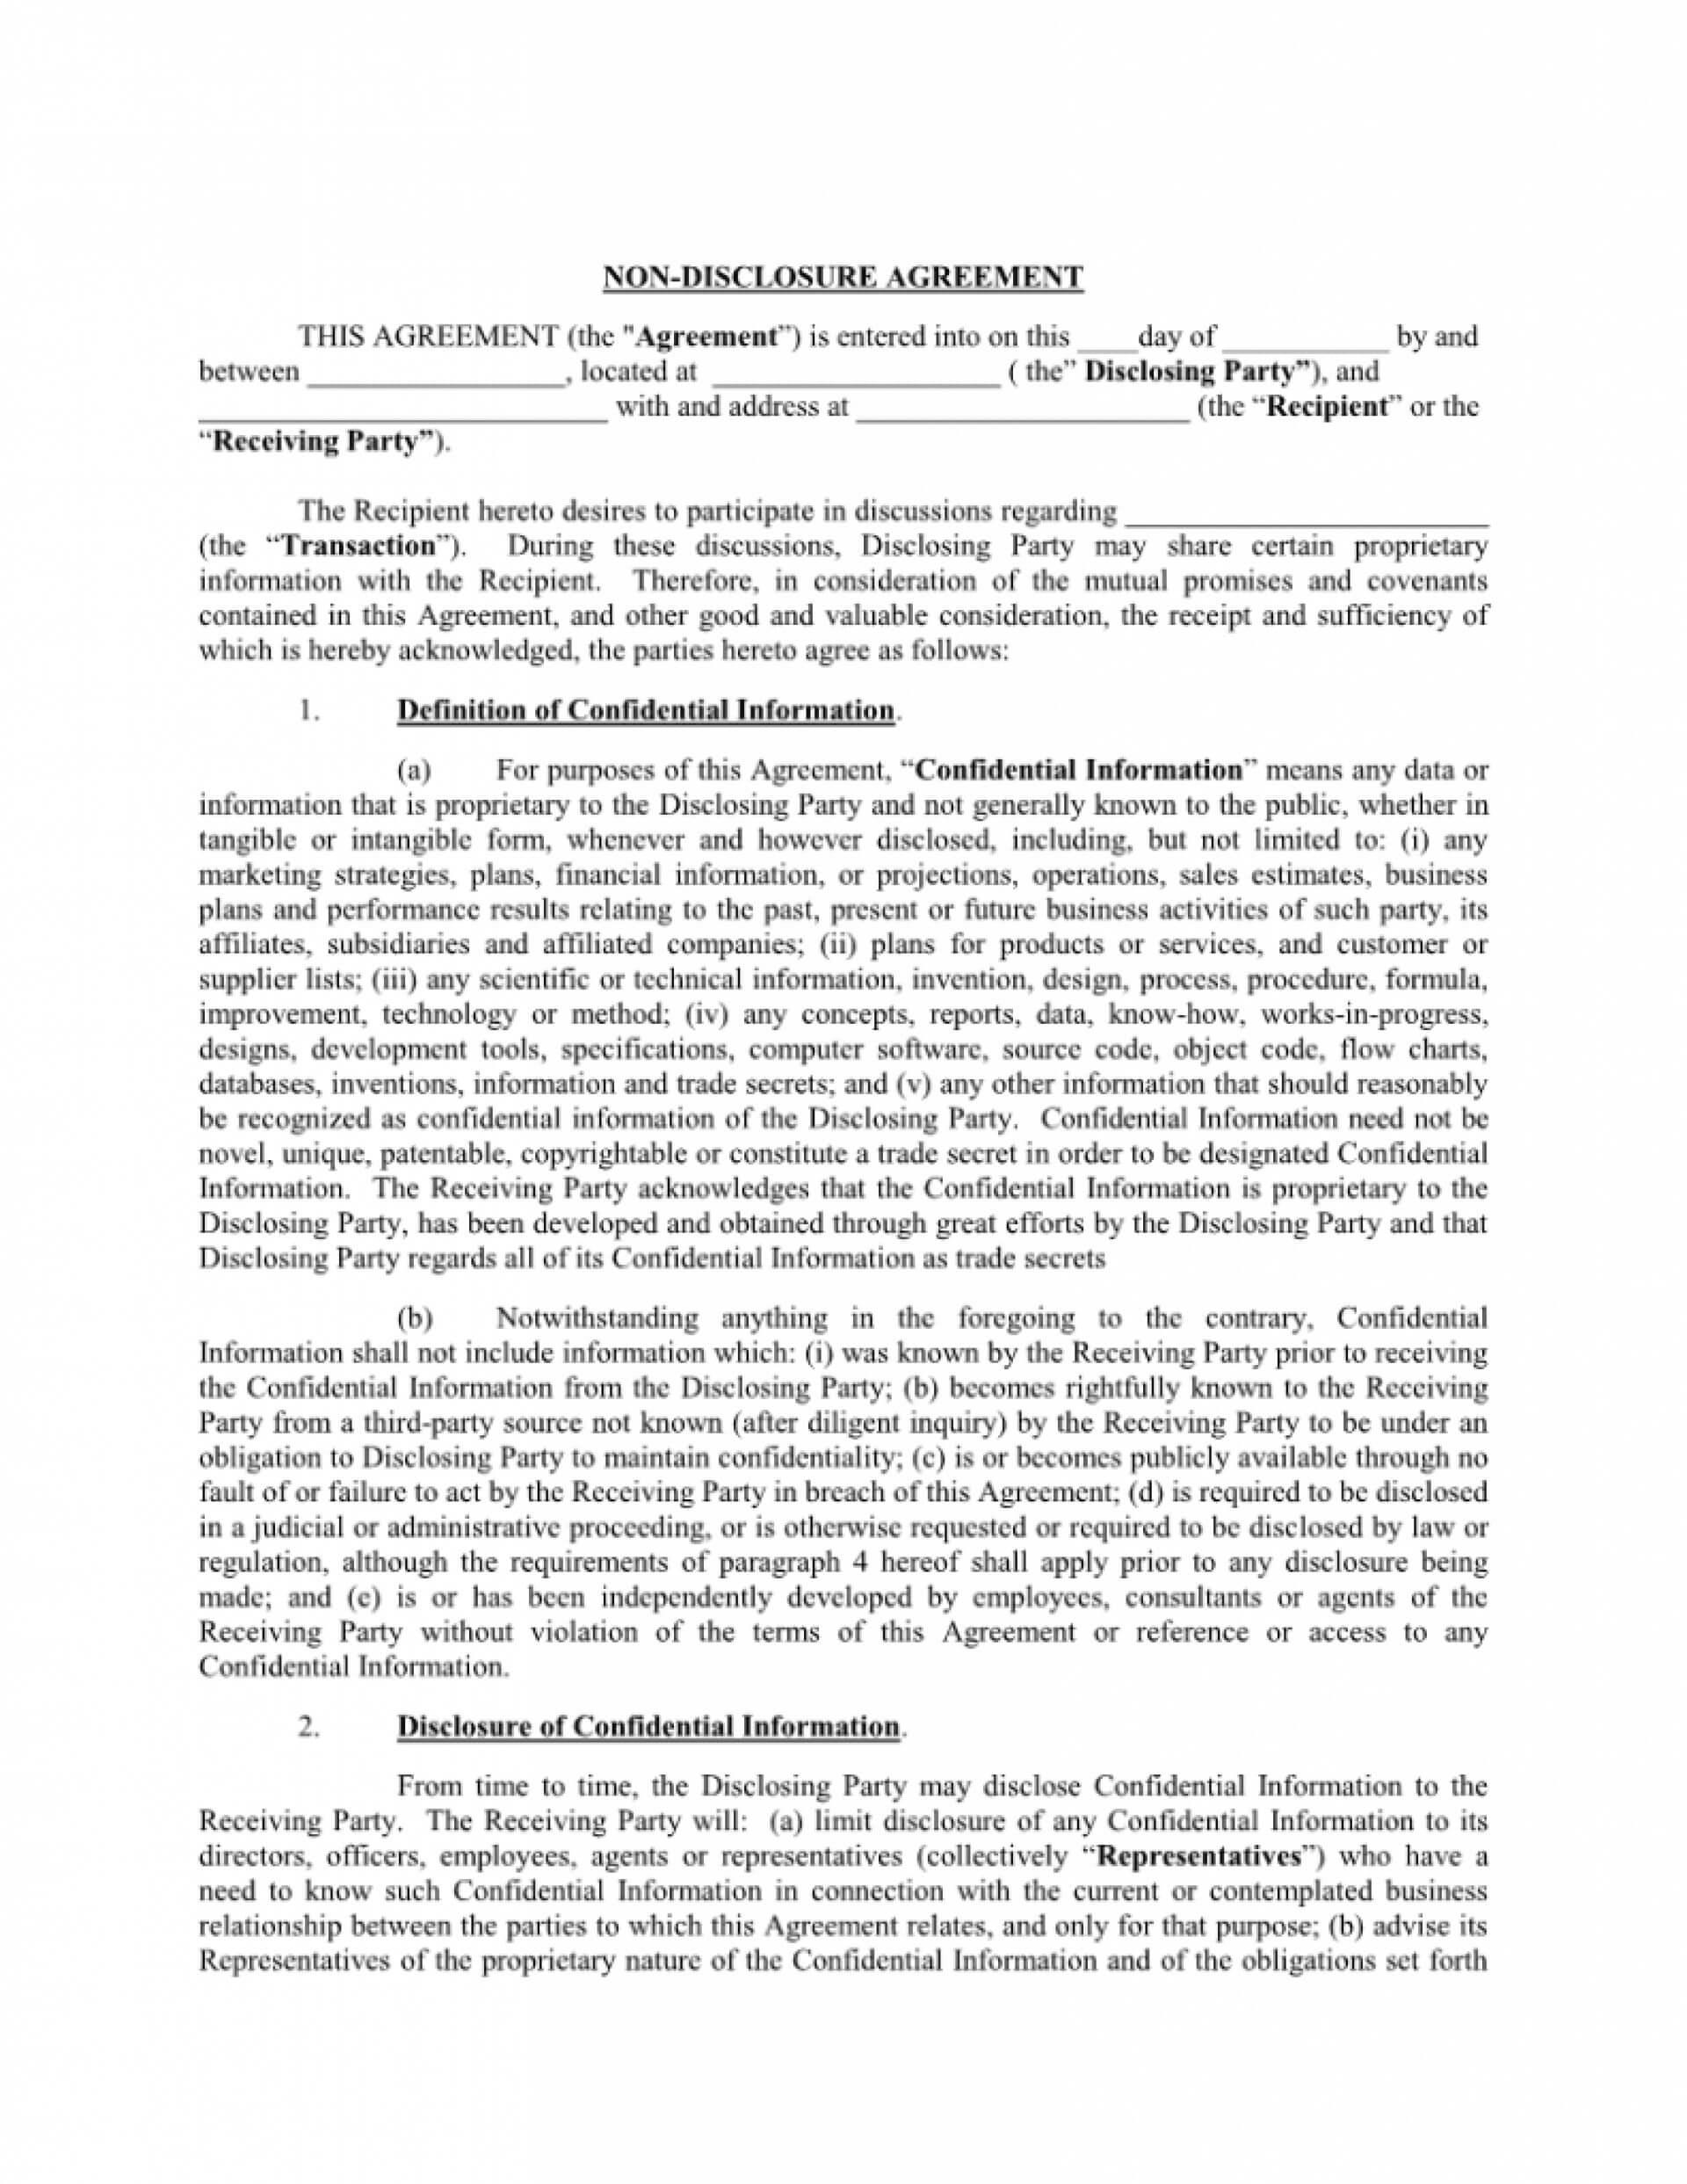 031 Internship Confidentiality Agreement Nda Template Word intended for Nda Template Word Document